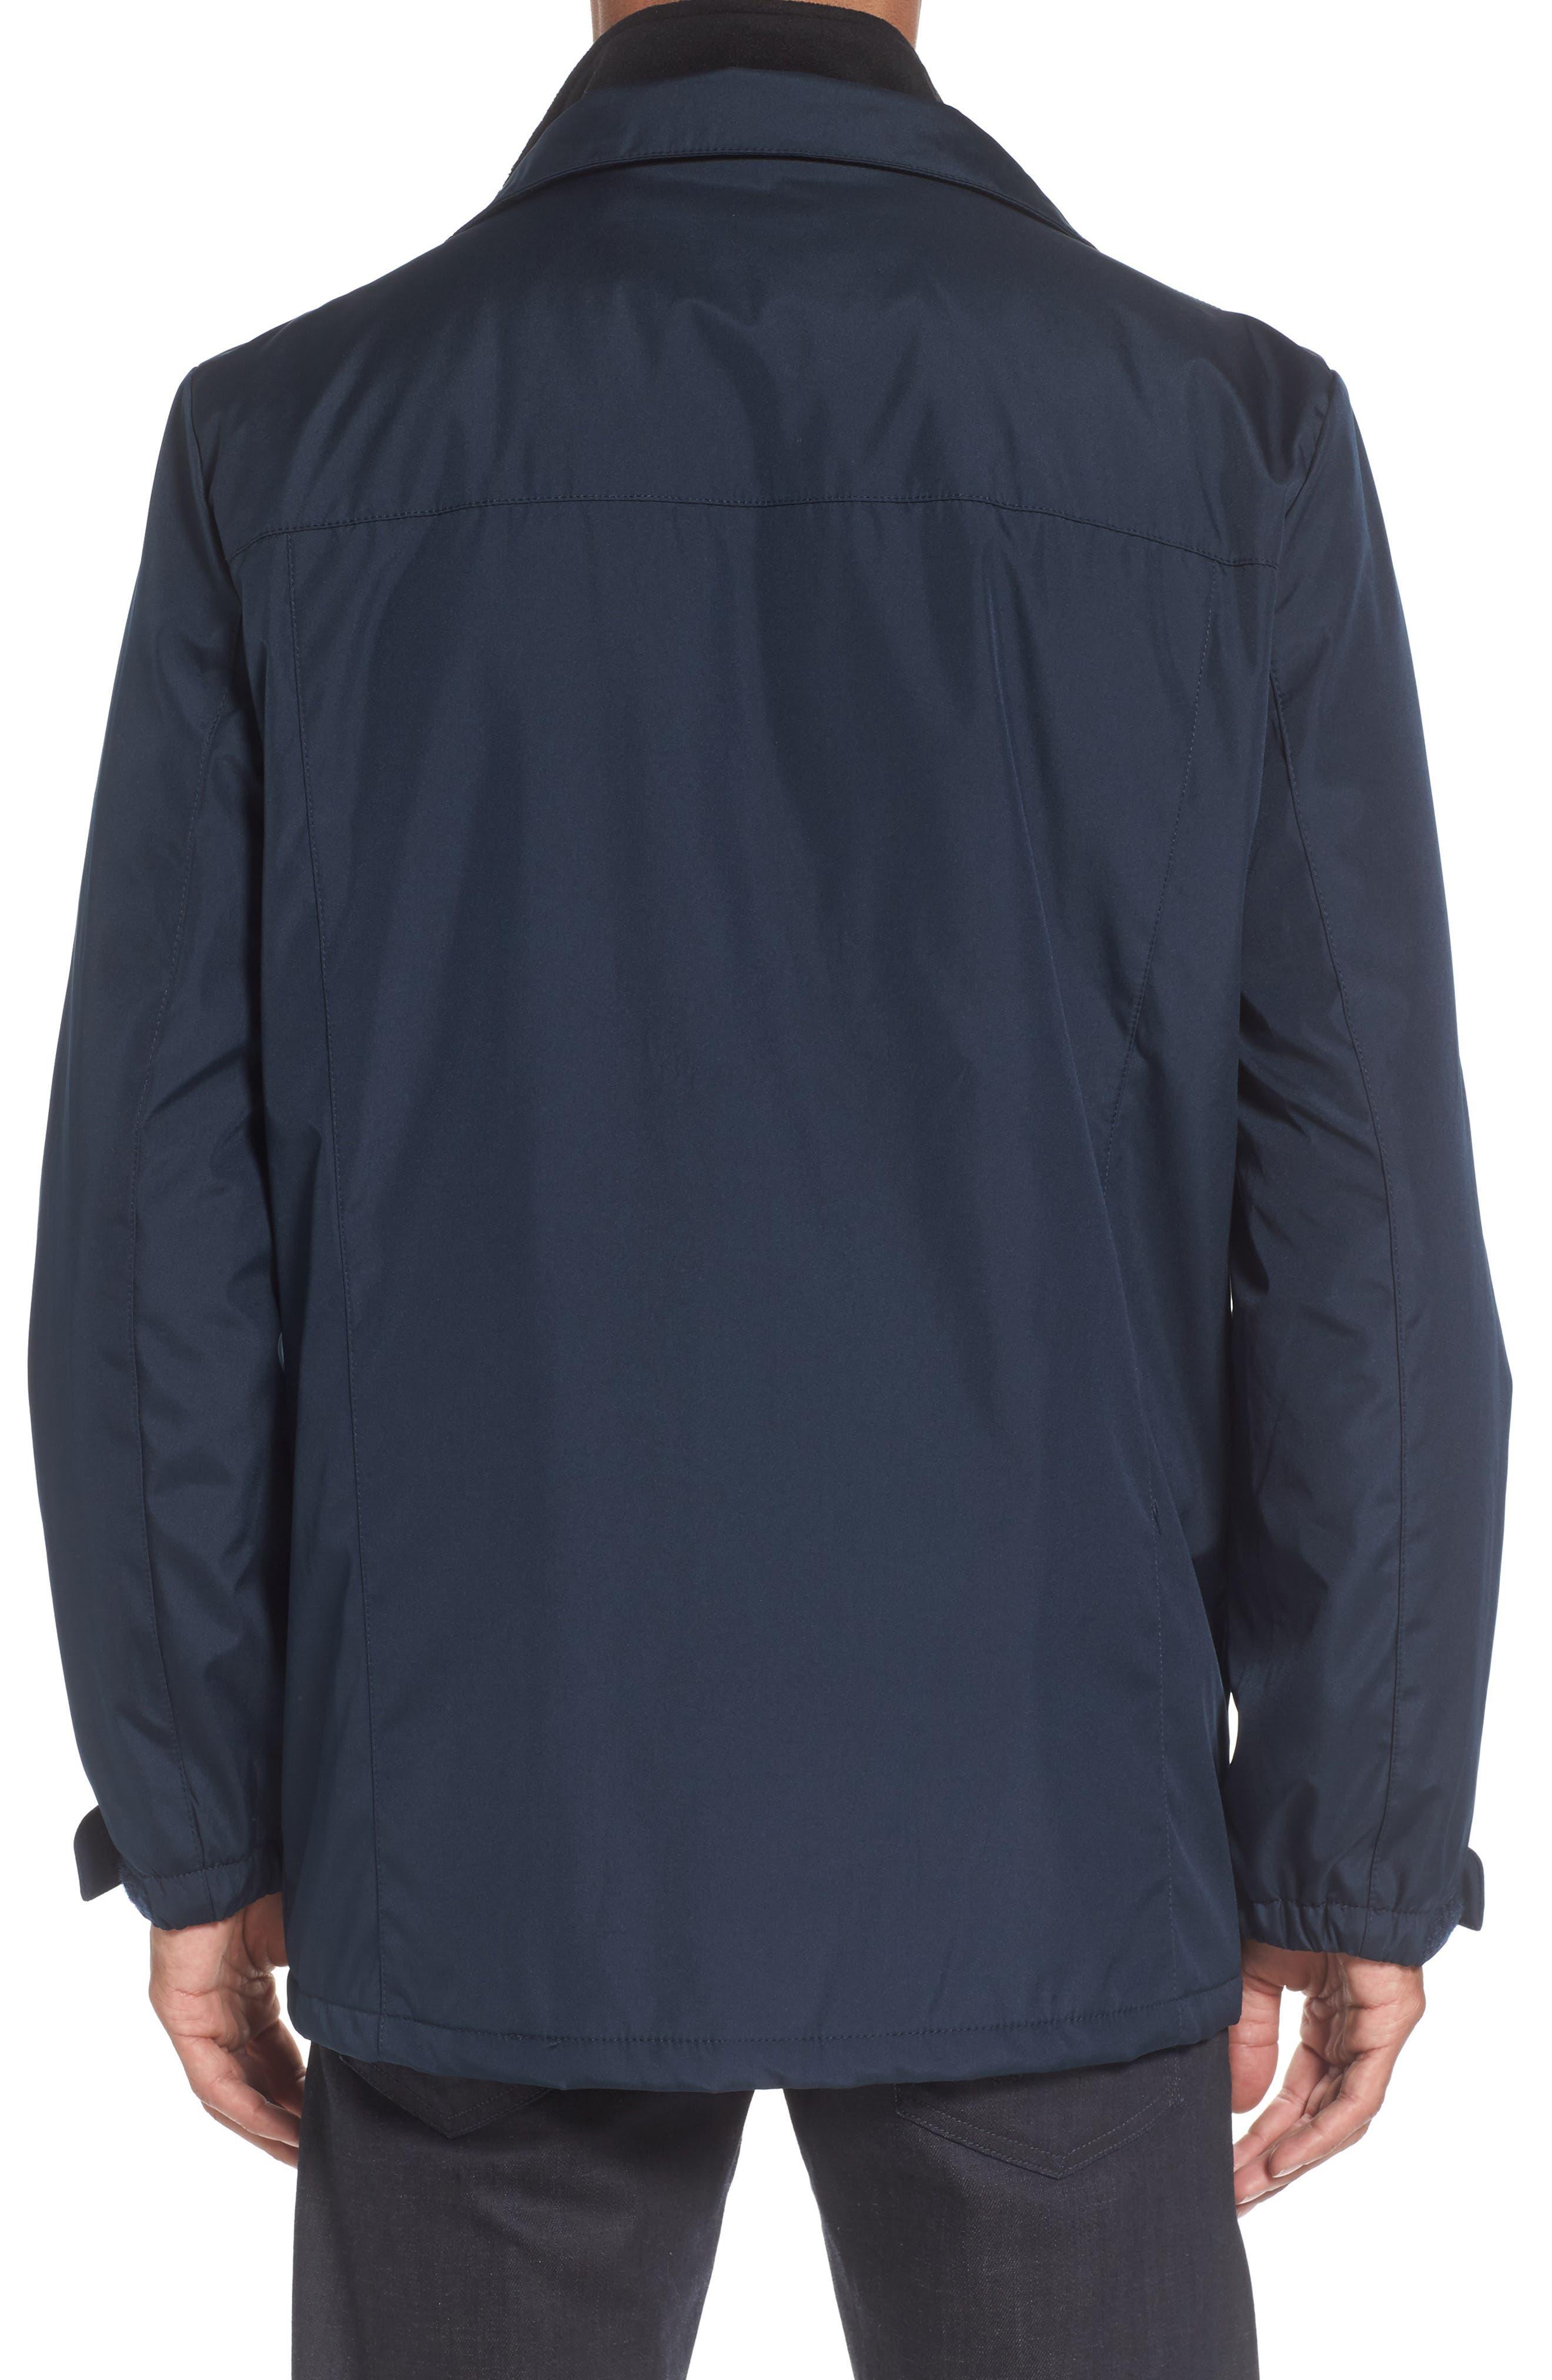 Hooded Jacket with Inset Fleece Bib,                             Alternate thumbnail 16, color,